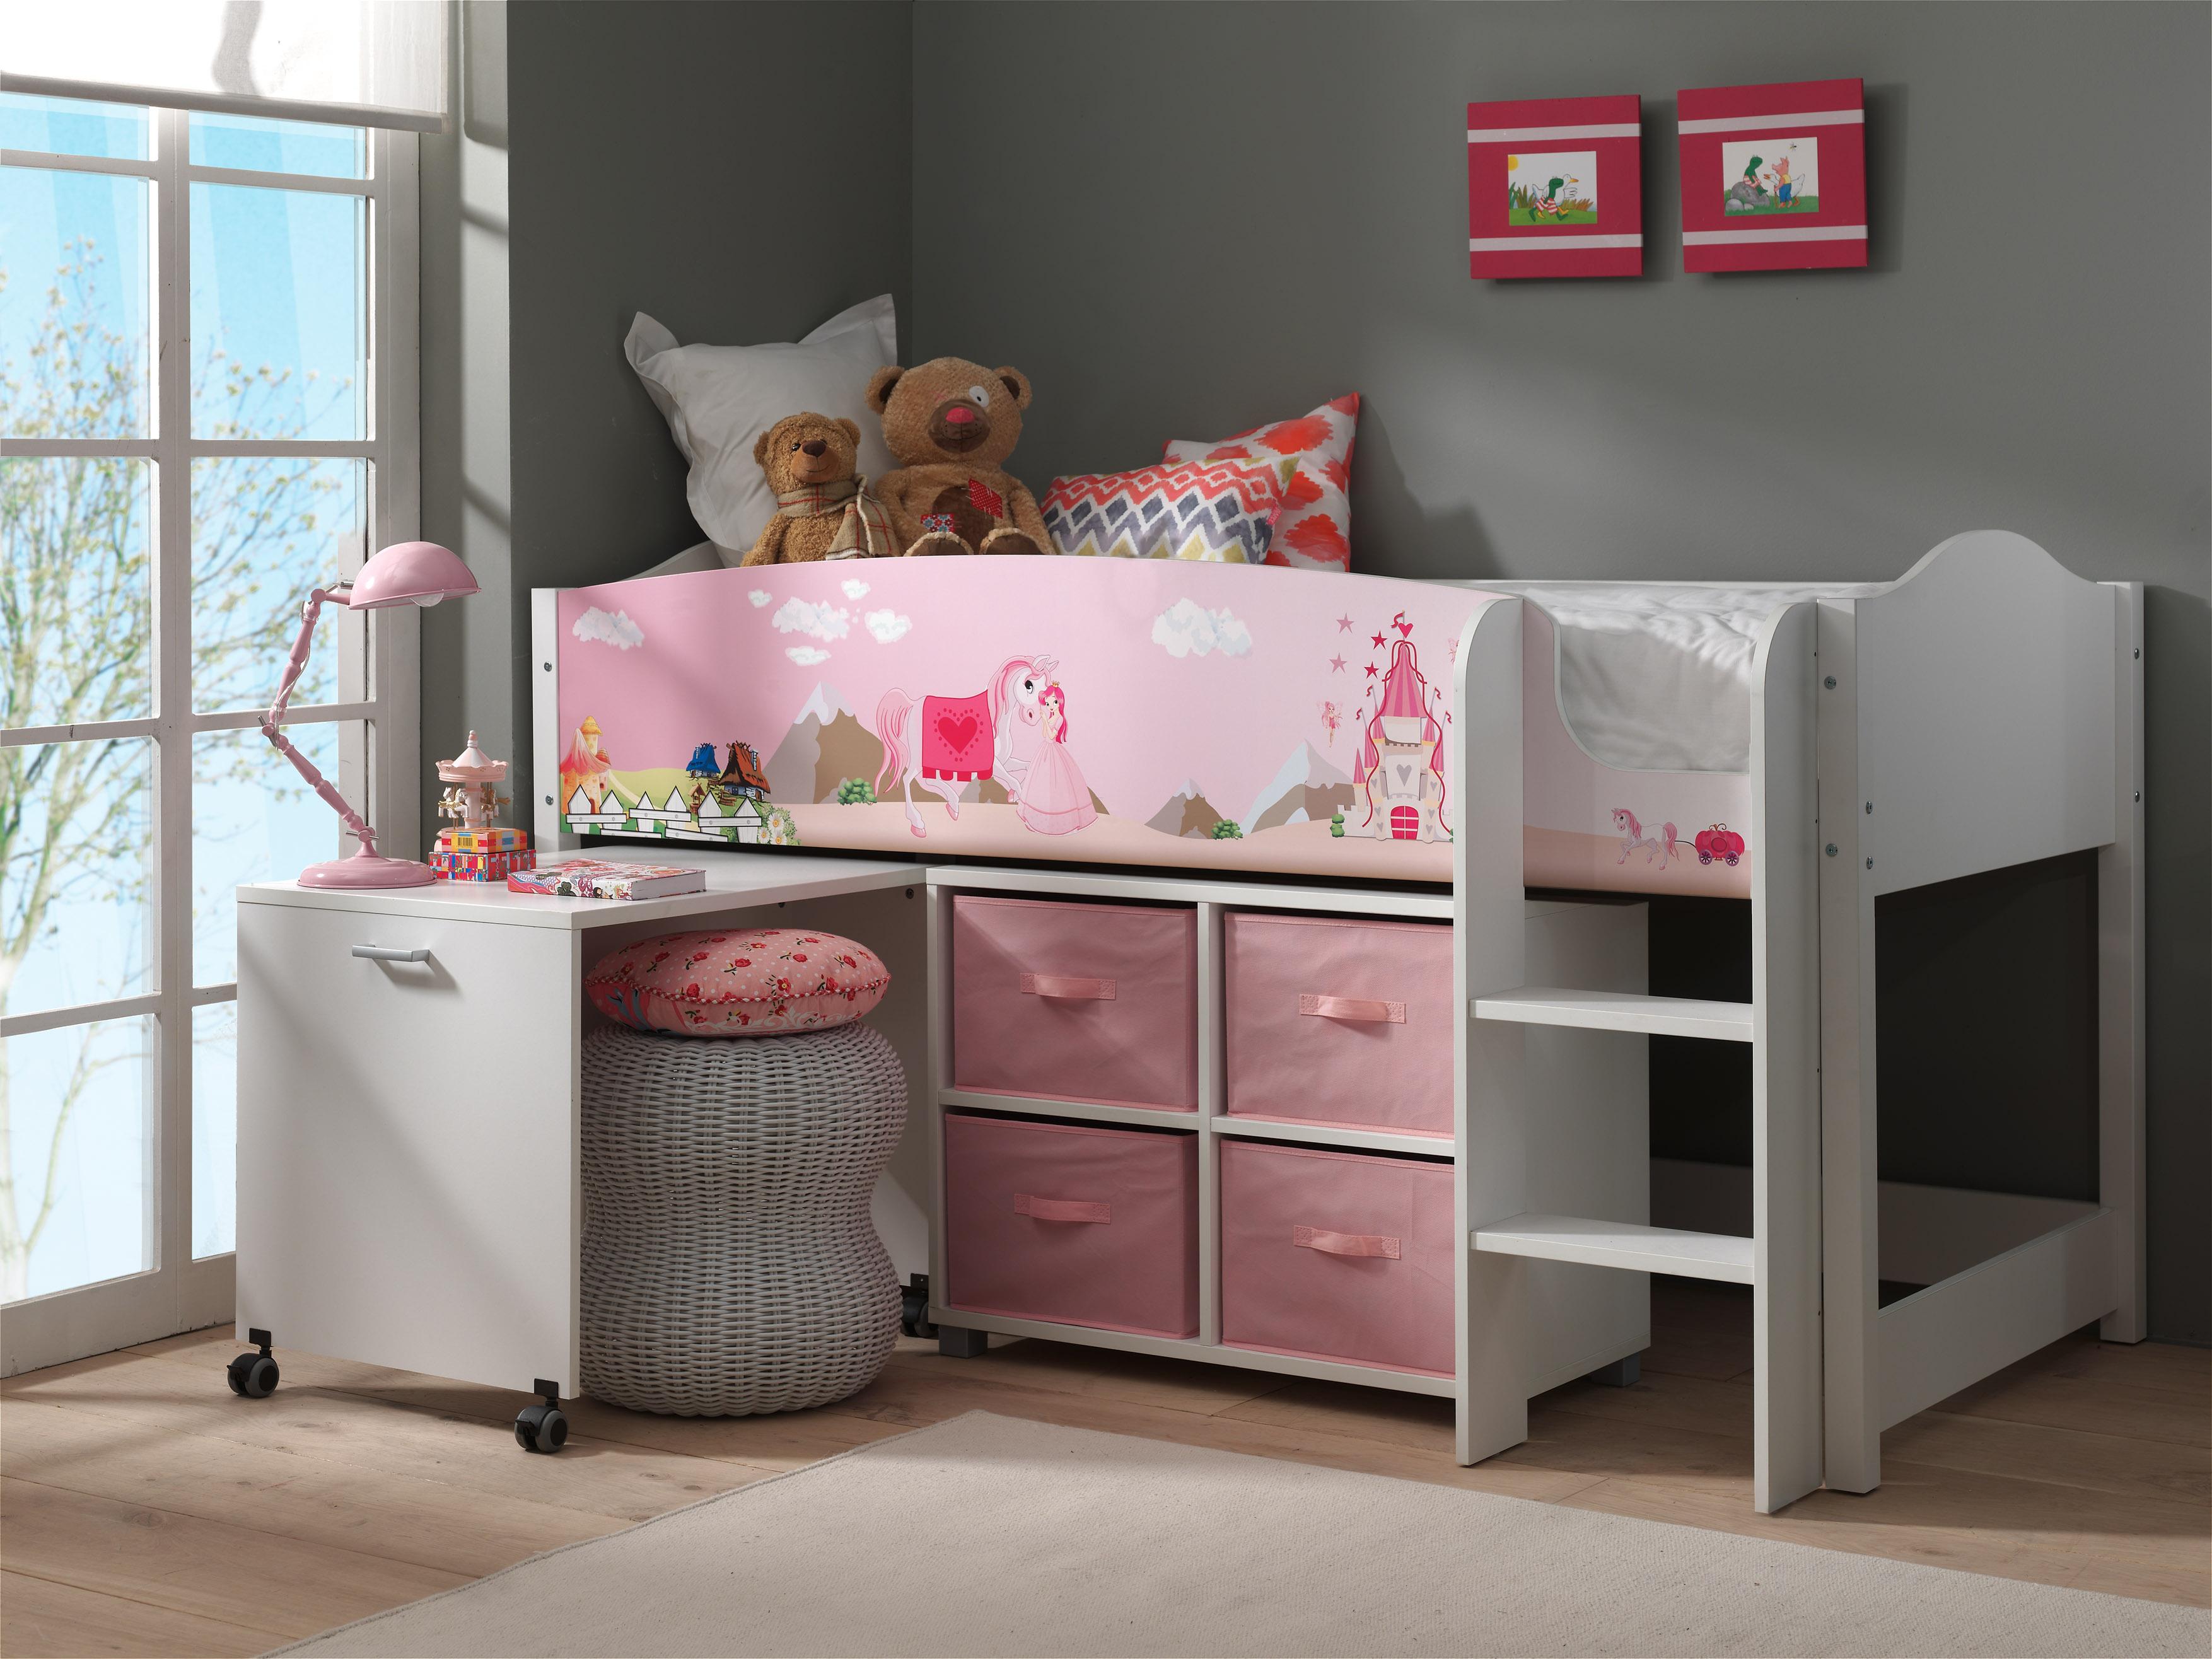 lit combin avec bureau lollipop princesse. Black Bedroom Furniture Sets. Home Design Ideas